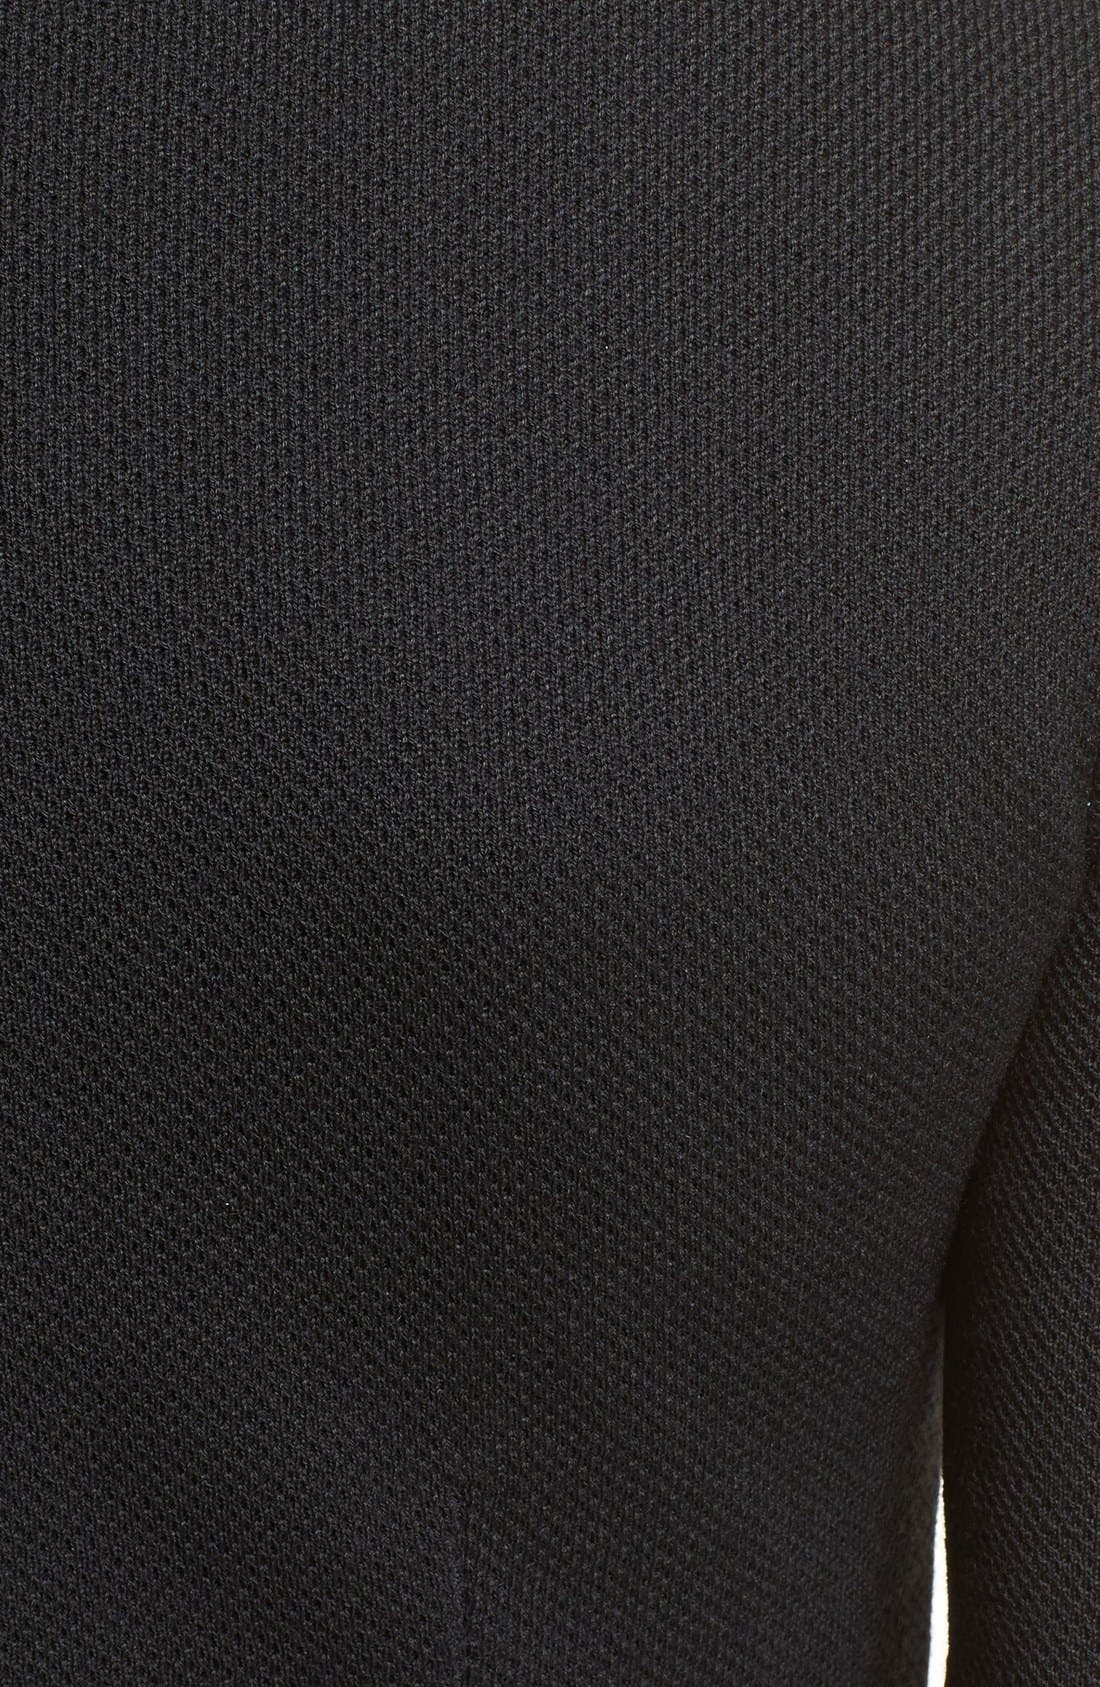 Peplum Milano Piqué Knit Dress,                             Alternate thumbnail 3, color,                             Caviar